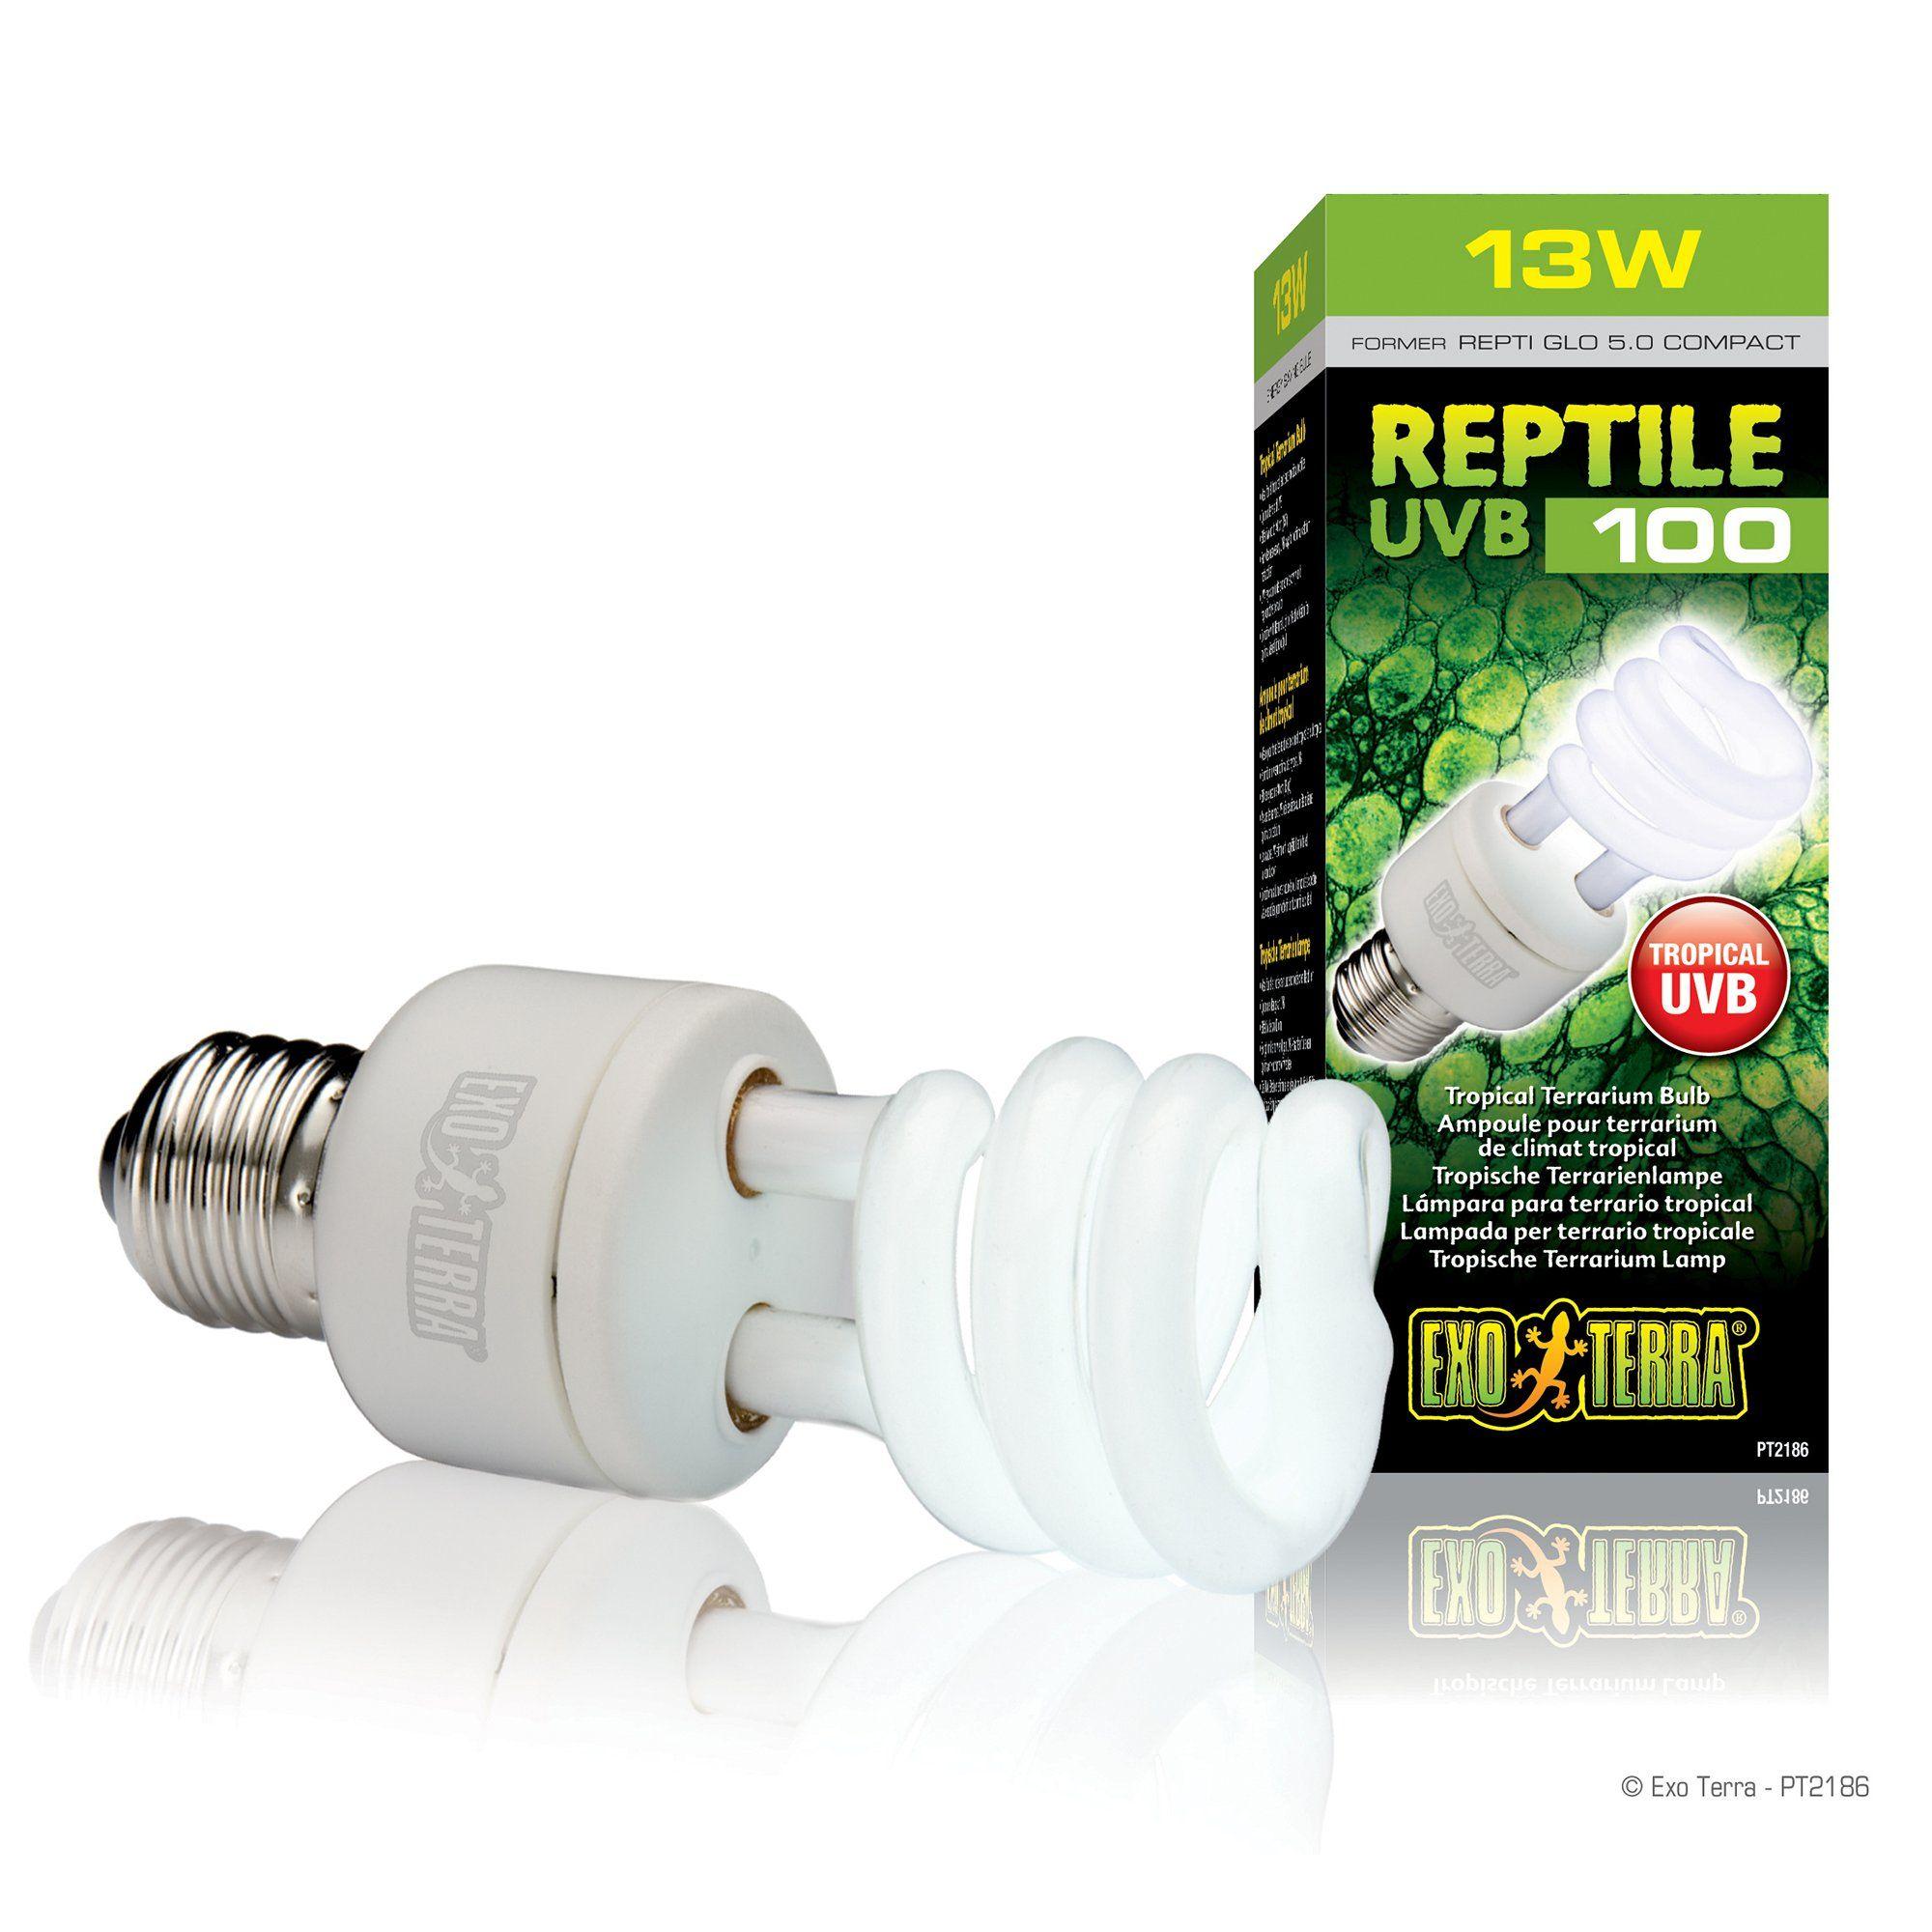 Exo Terra Reptile Uvb 100 13w Tropical Terrariums Terrarium